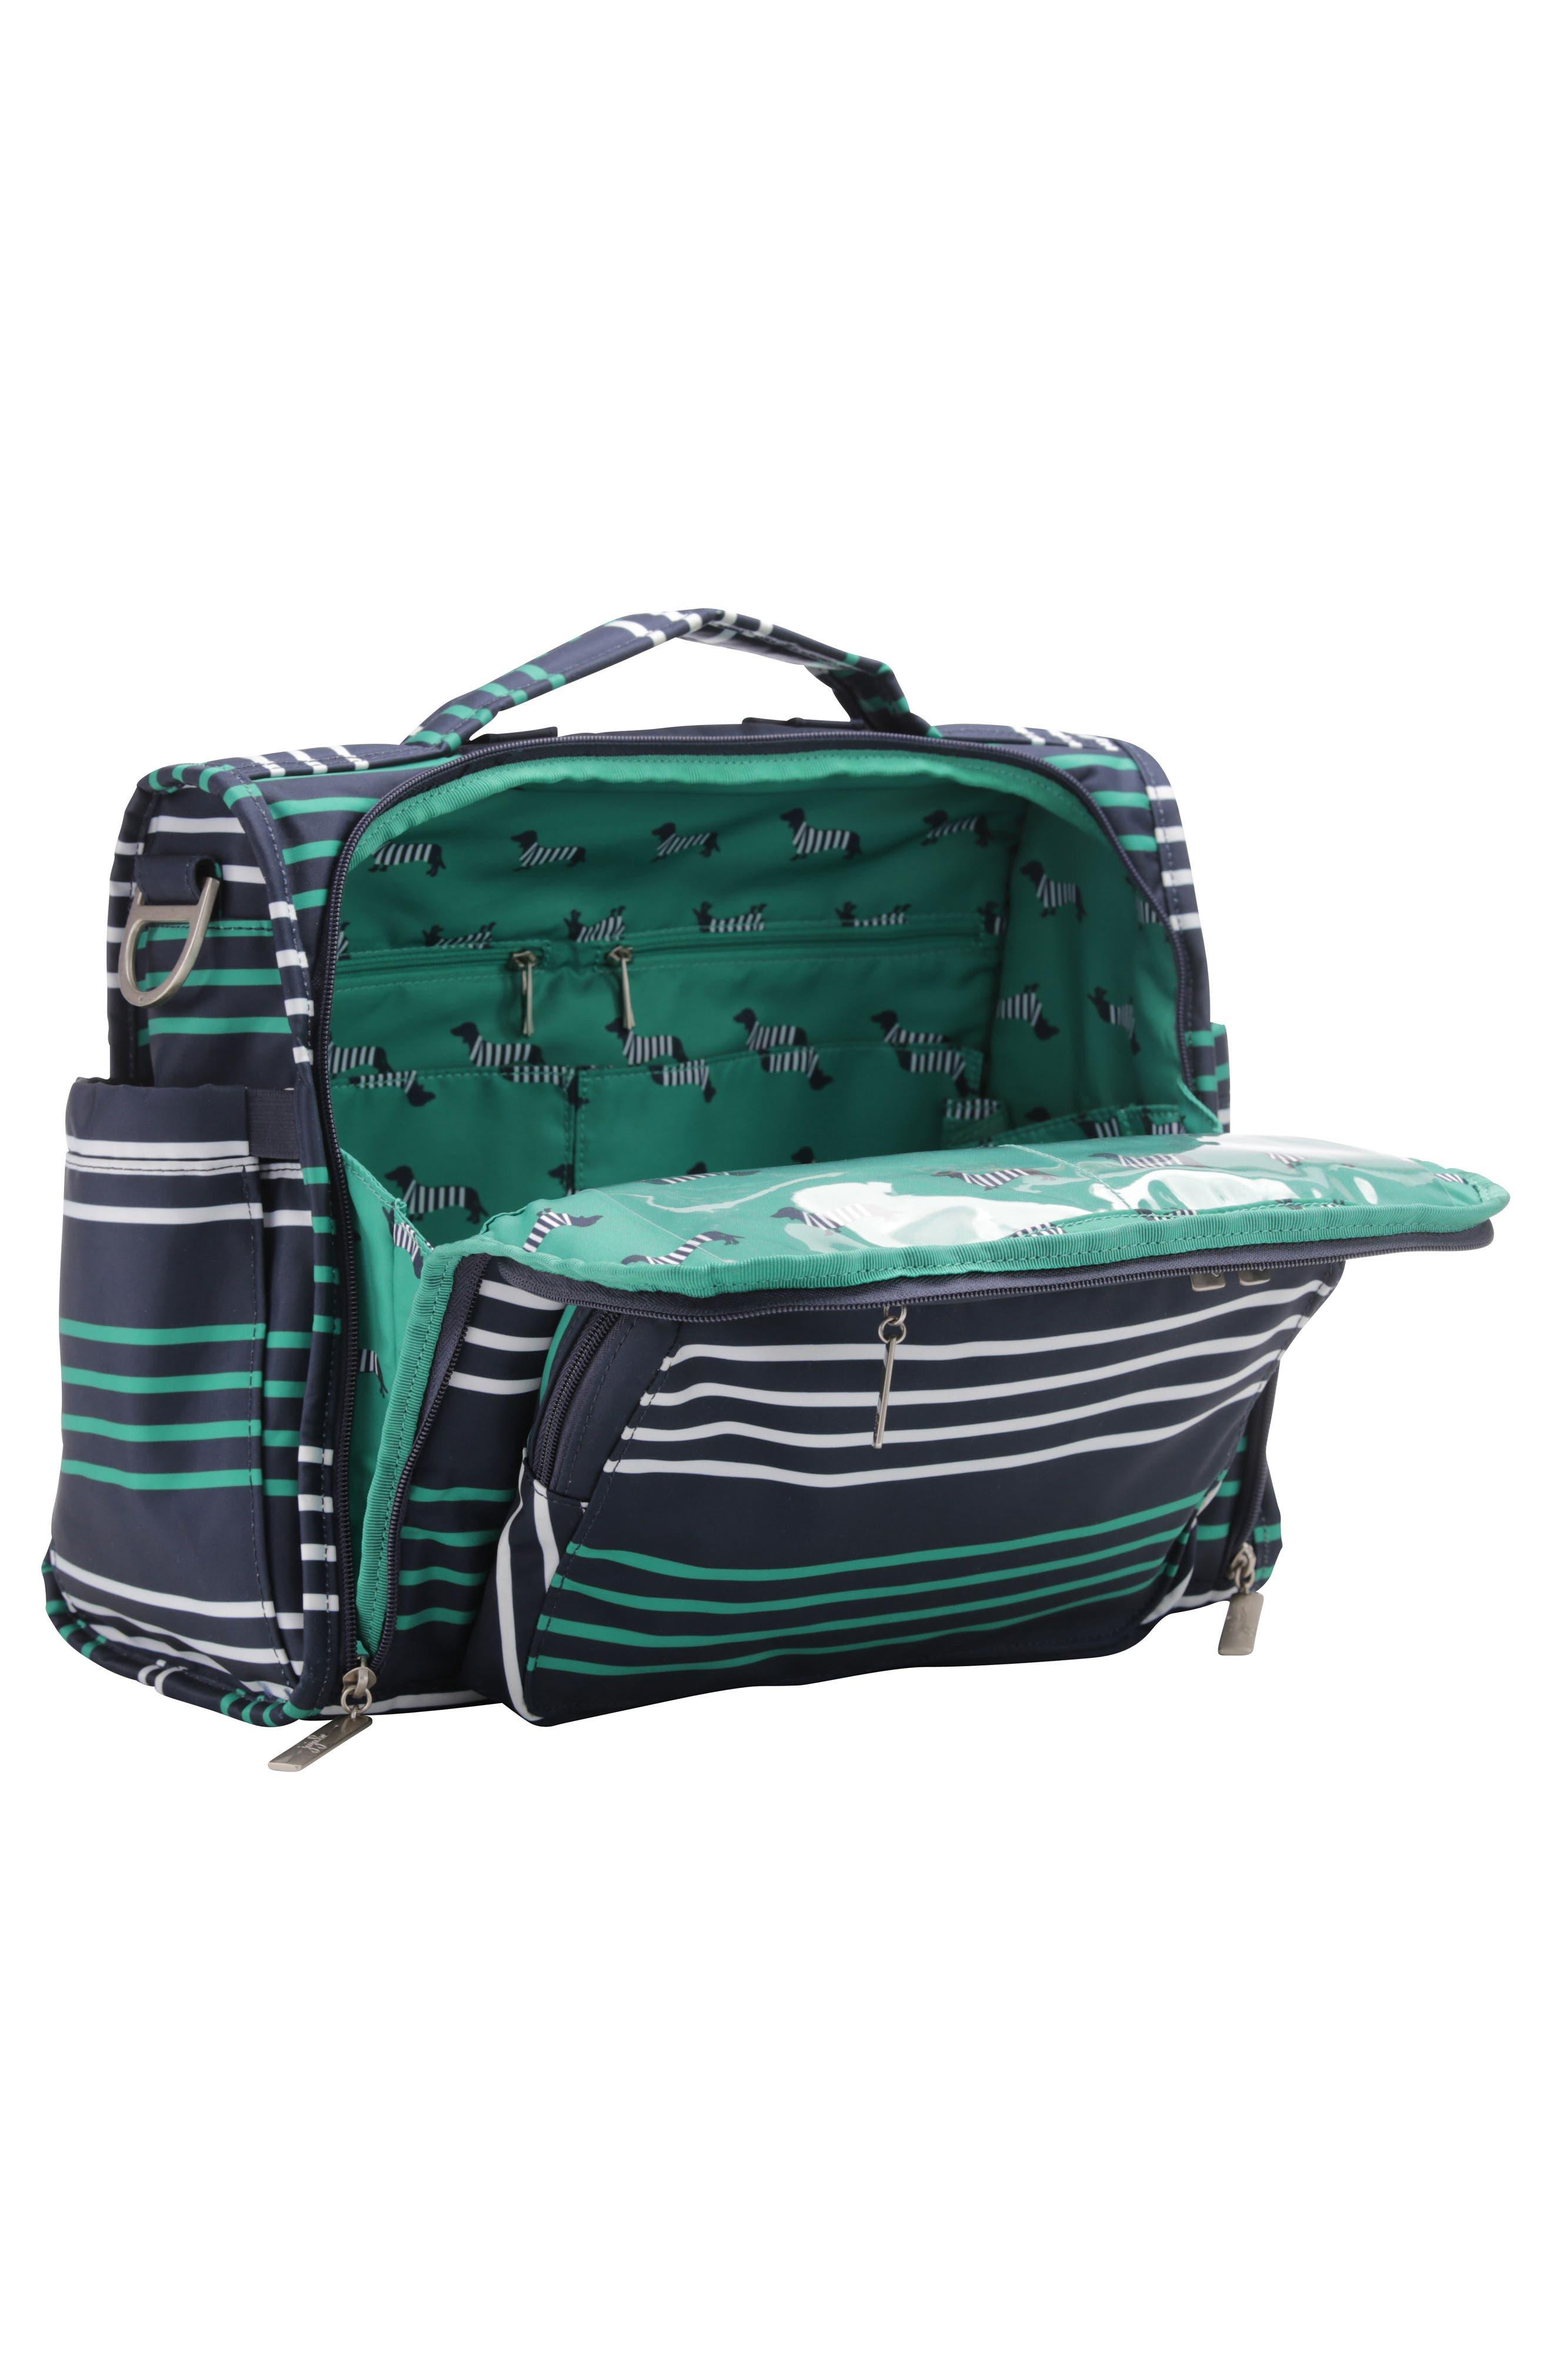 BFF - Coastal Collection Diaper Bag,                             Alternate thumbnail 9, color,